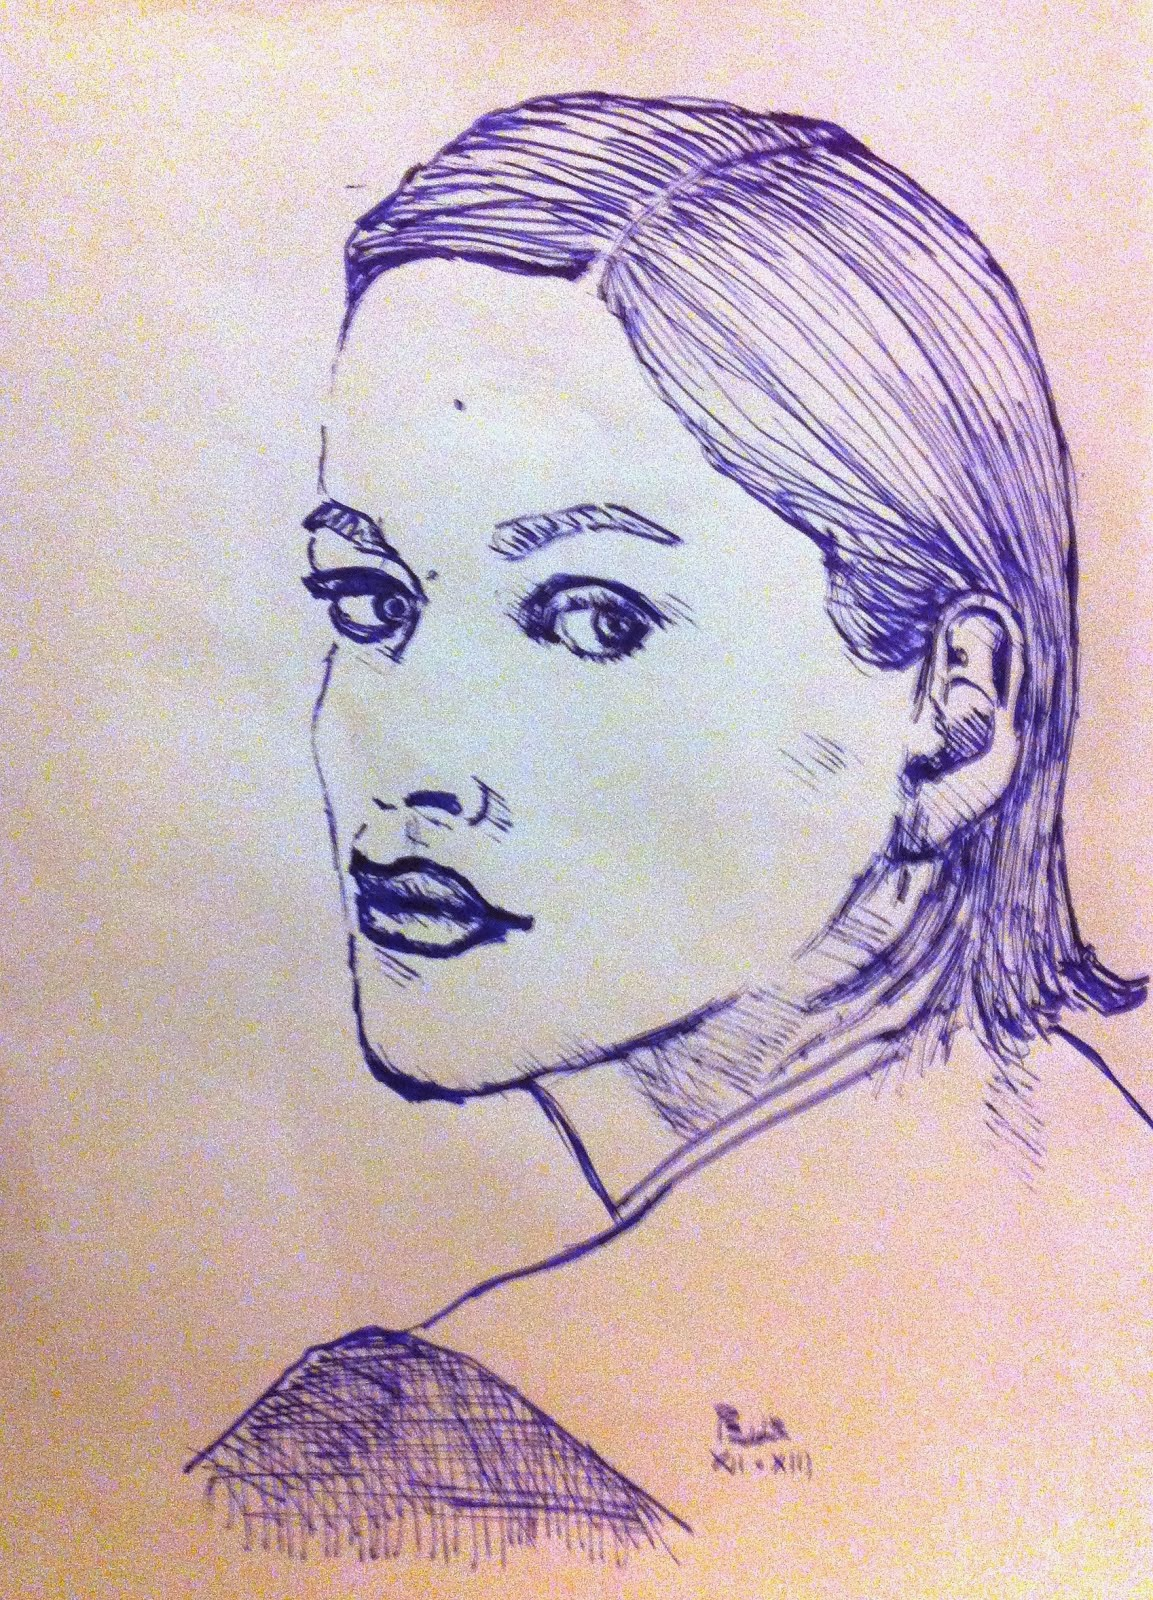 Peut Etre (Blu inchiostro stilo)